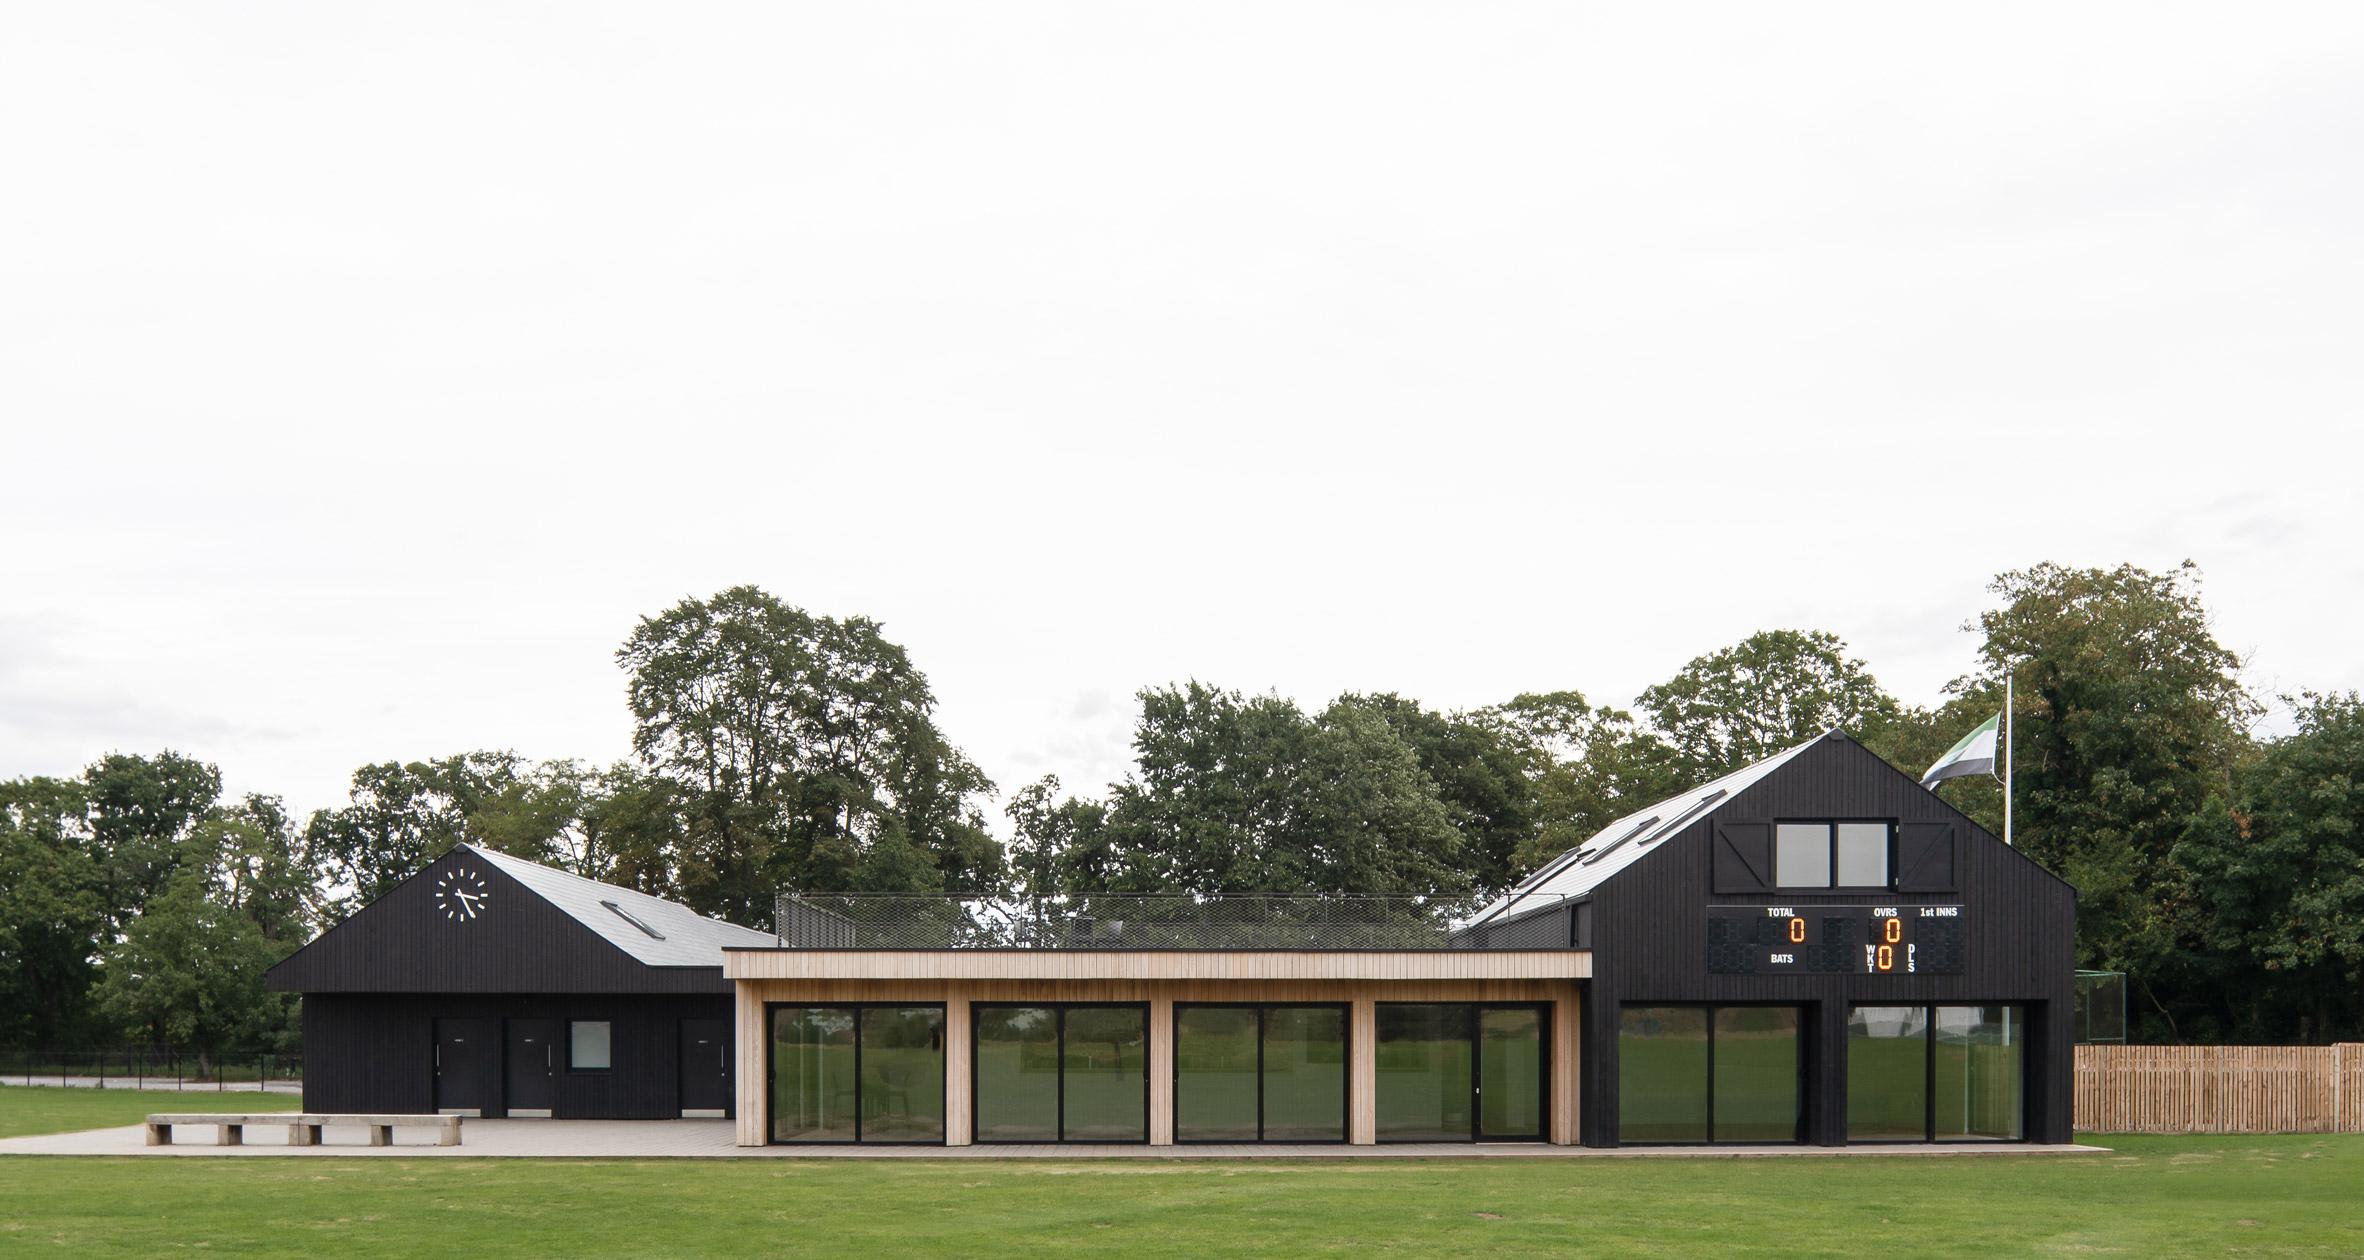 Cricket pavilion in London